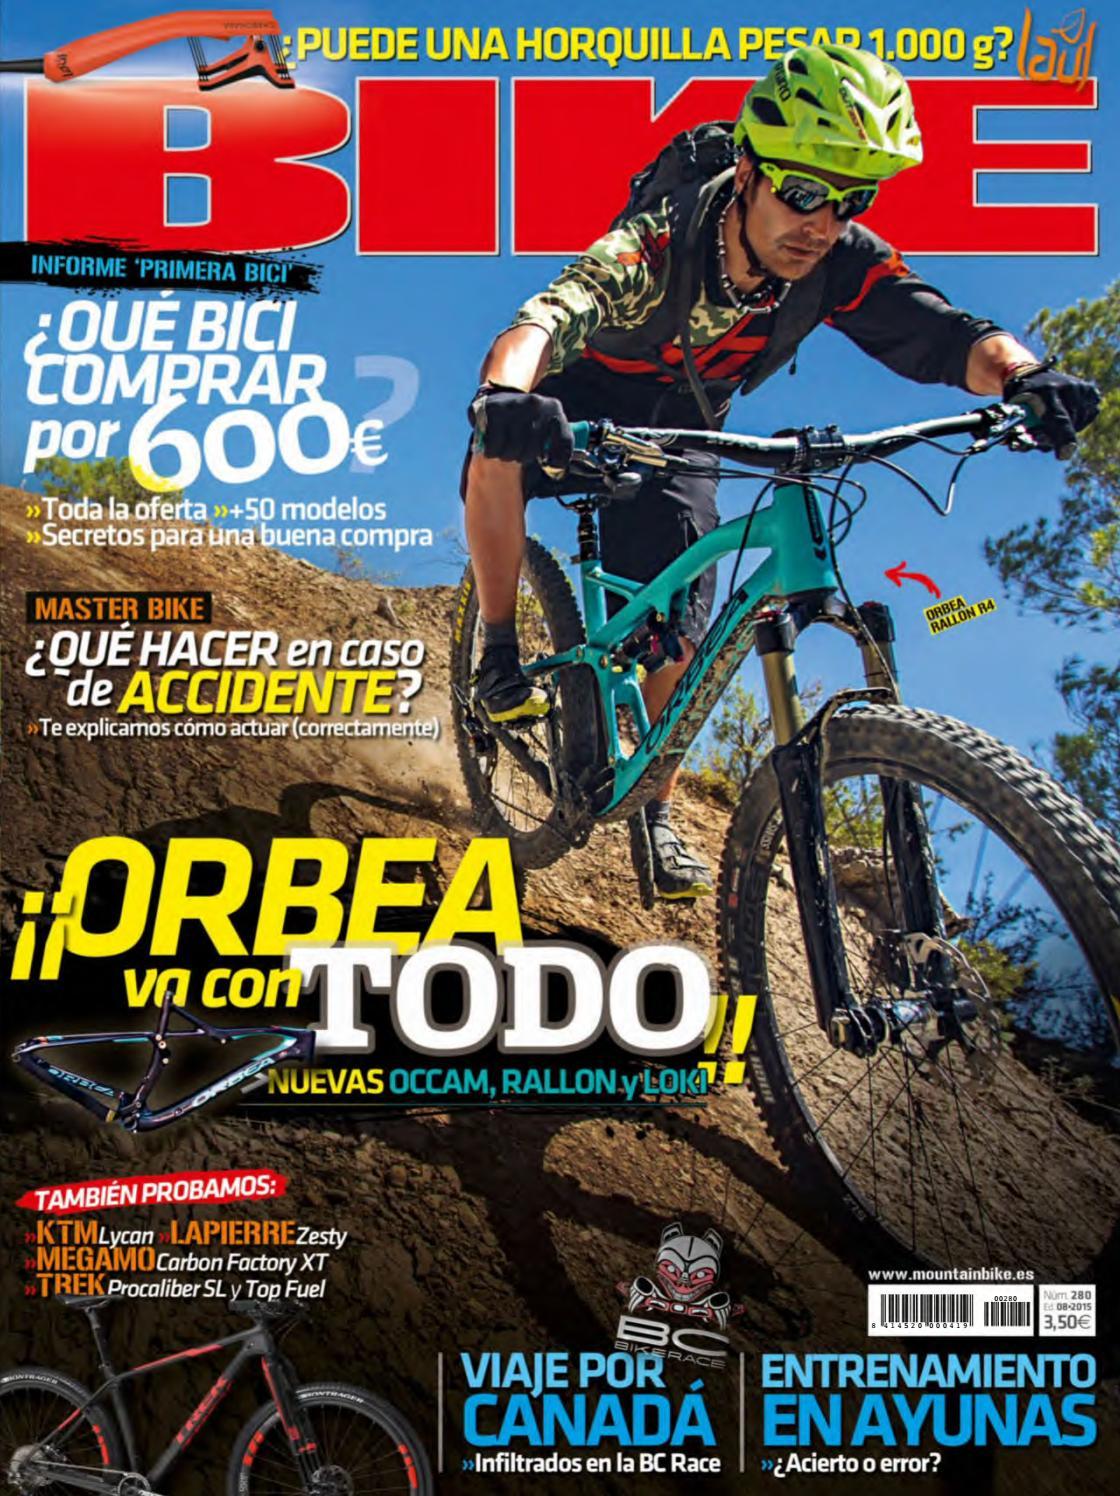 Bike españa 280 agosto 2015 by bruss7 - issuu